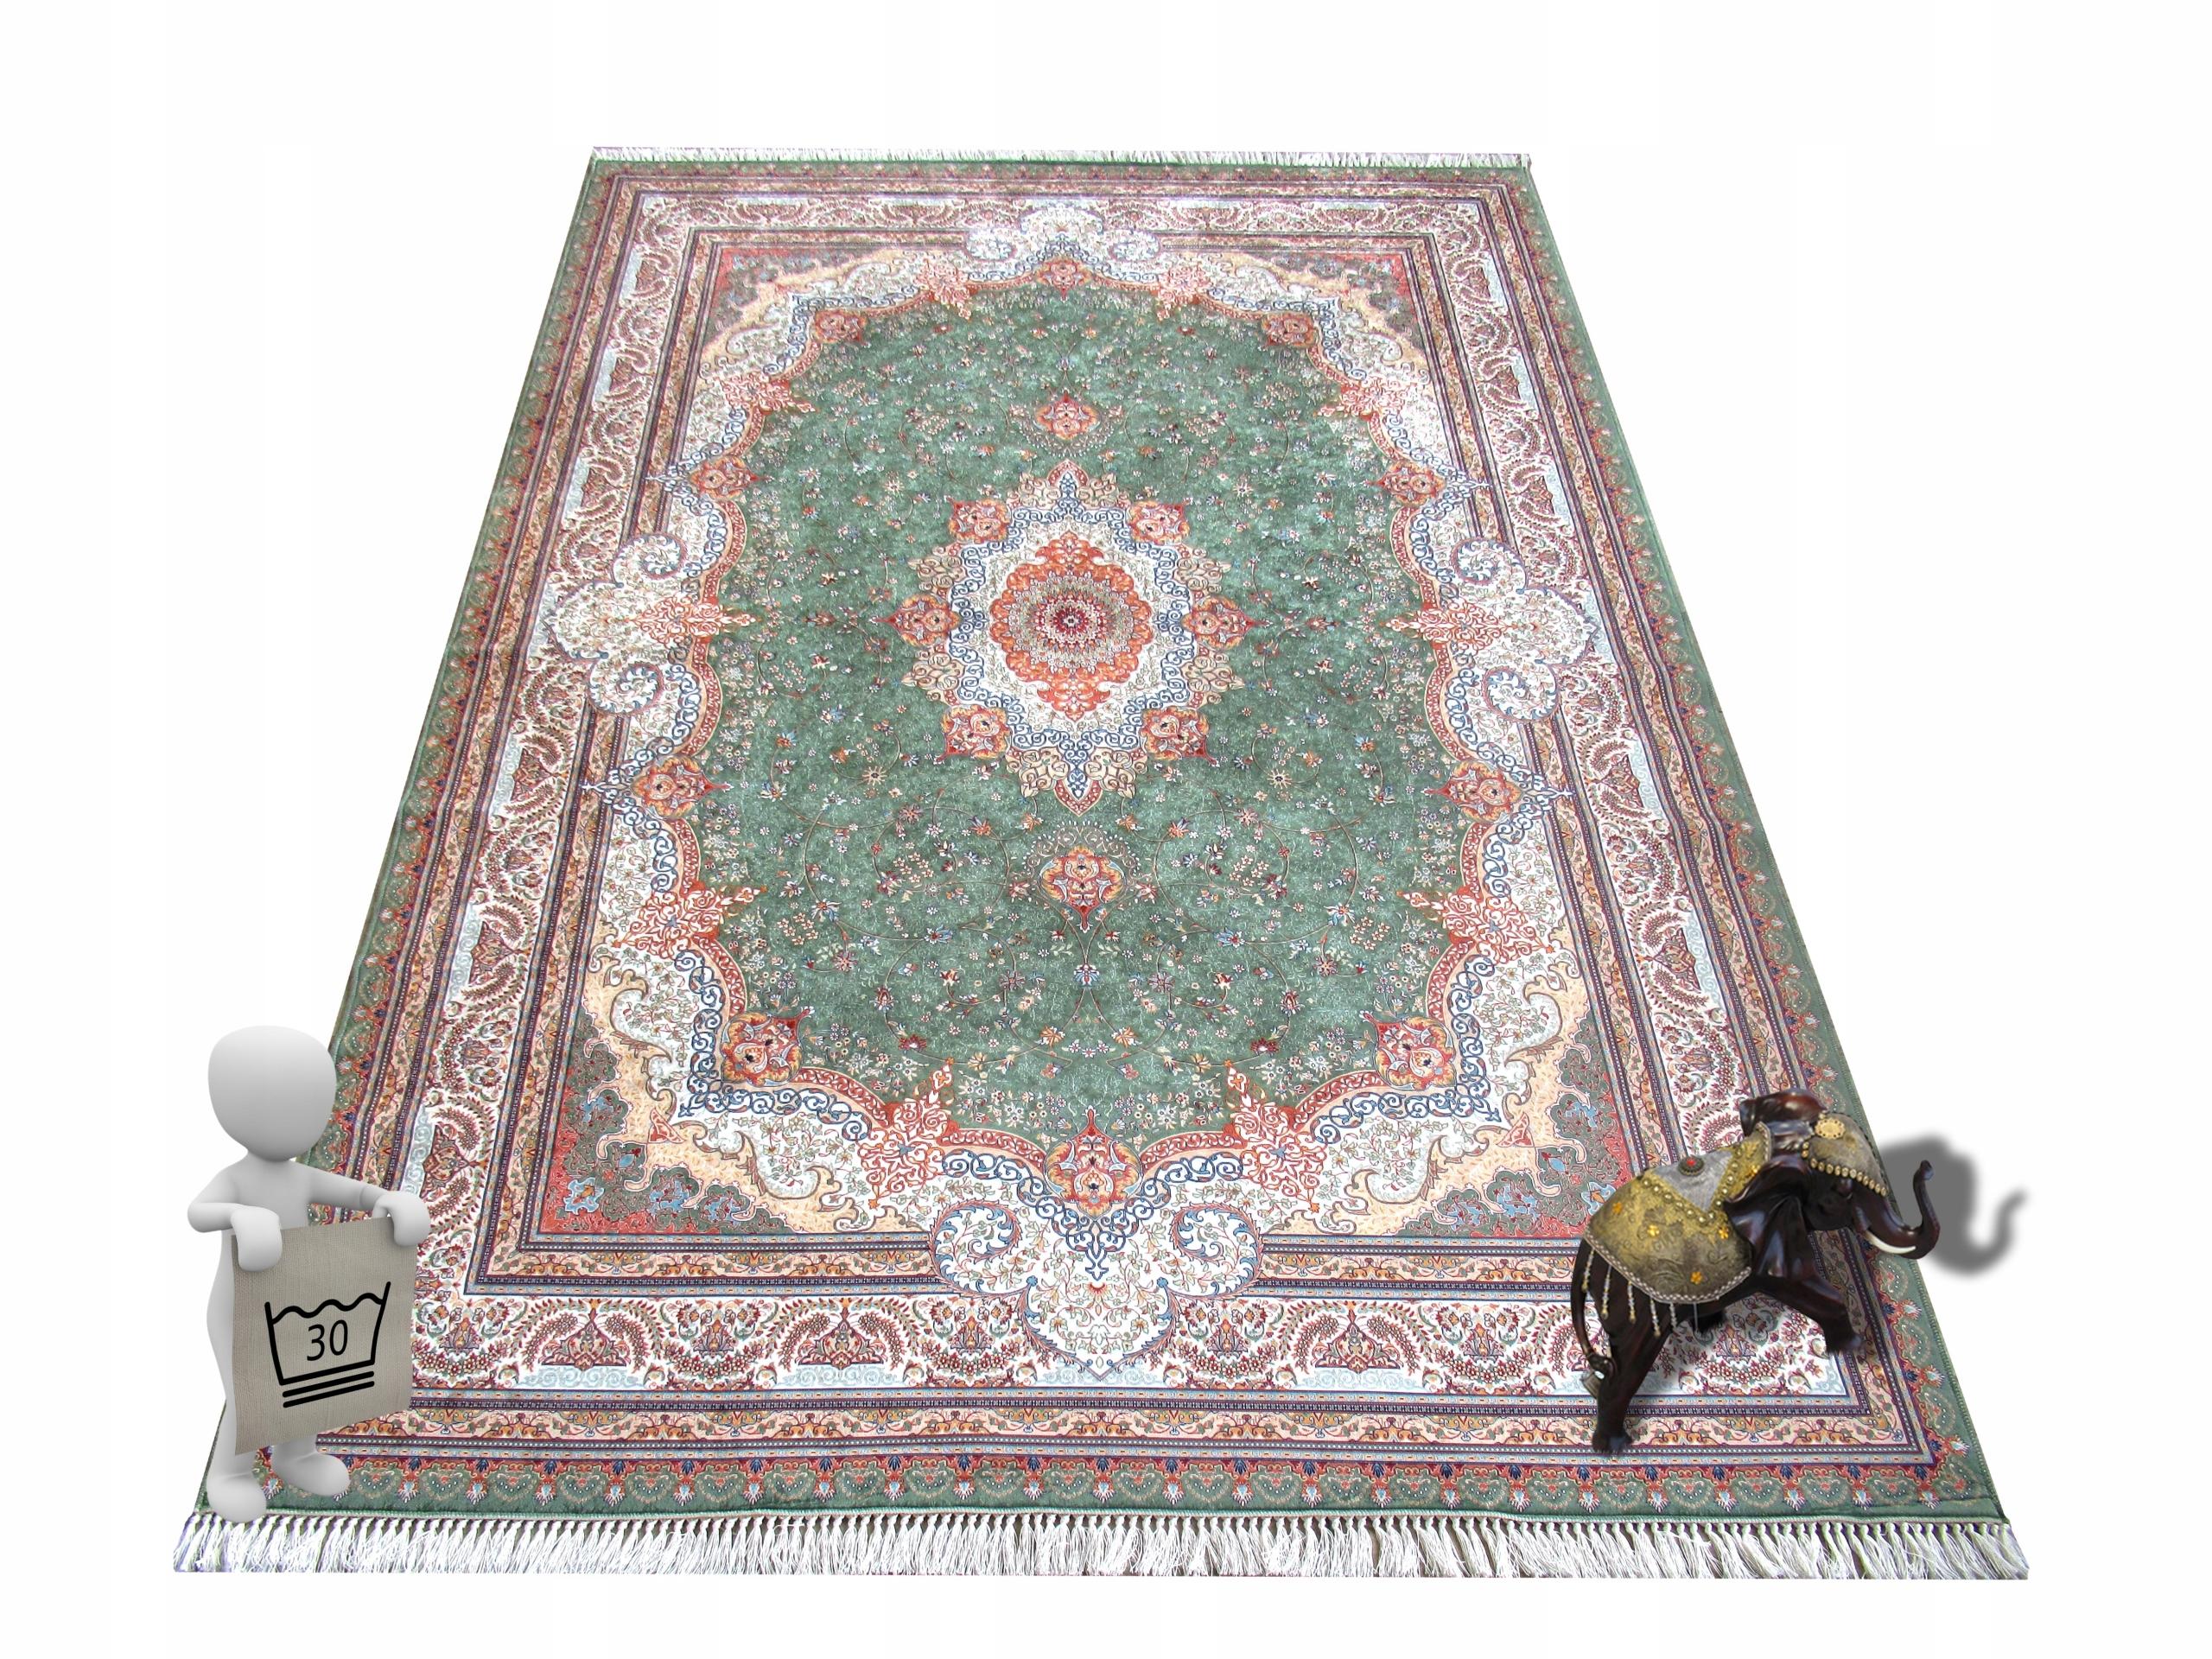 Koberec Perzský koberec Vzor TABRIZ 06 180x280 non-Slip